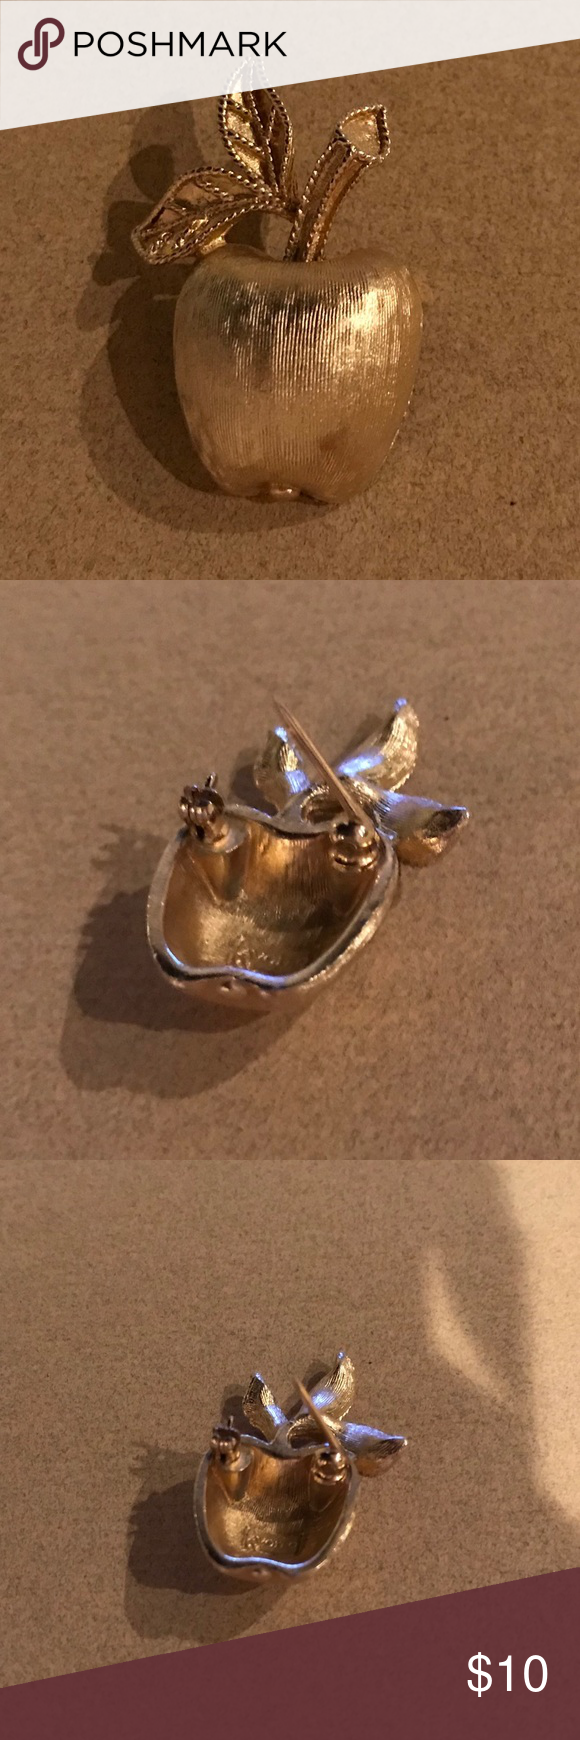 Vintage Apple Pin By Avon Avon Jewelry Vintage Apple Vintage